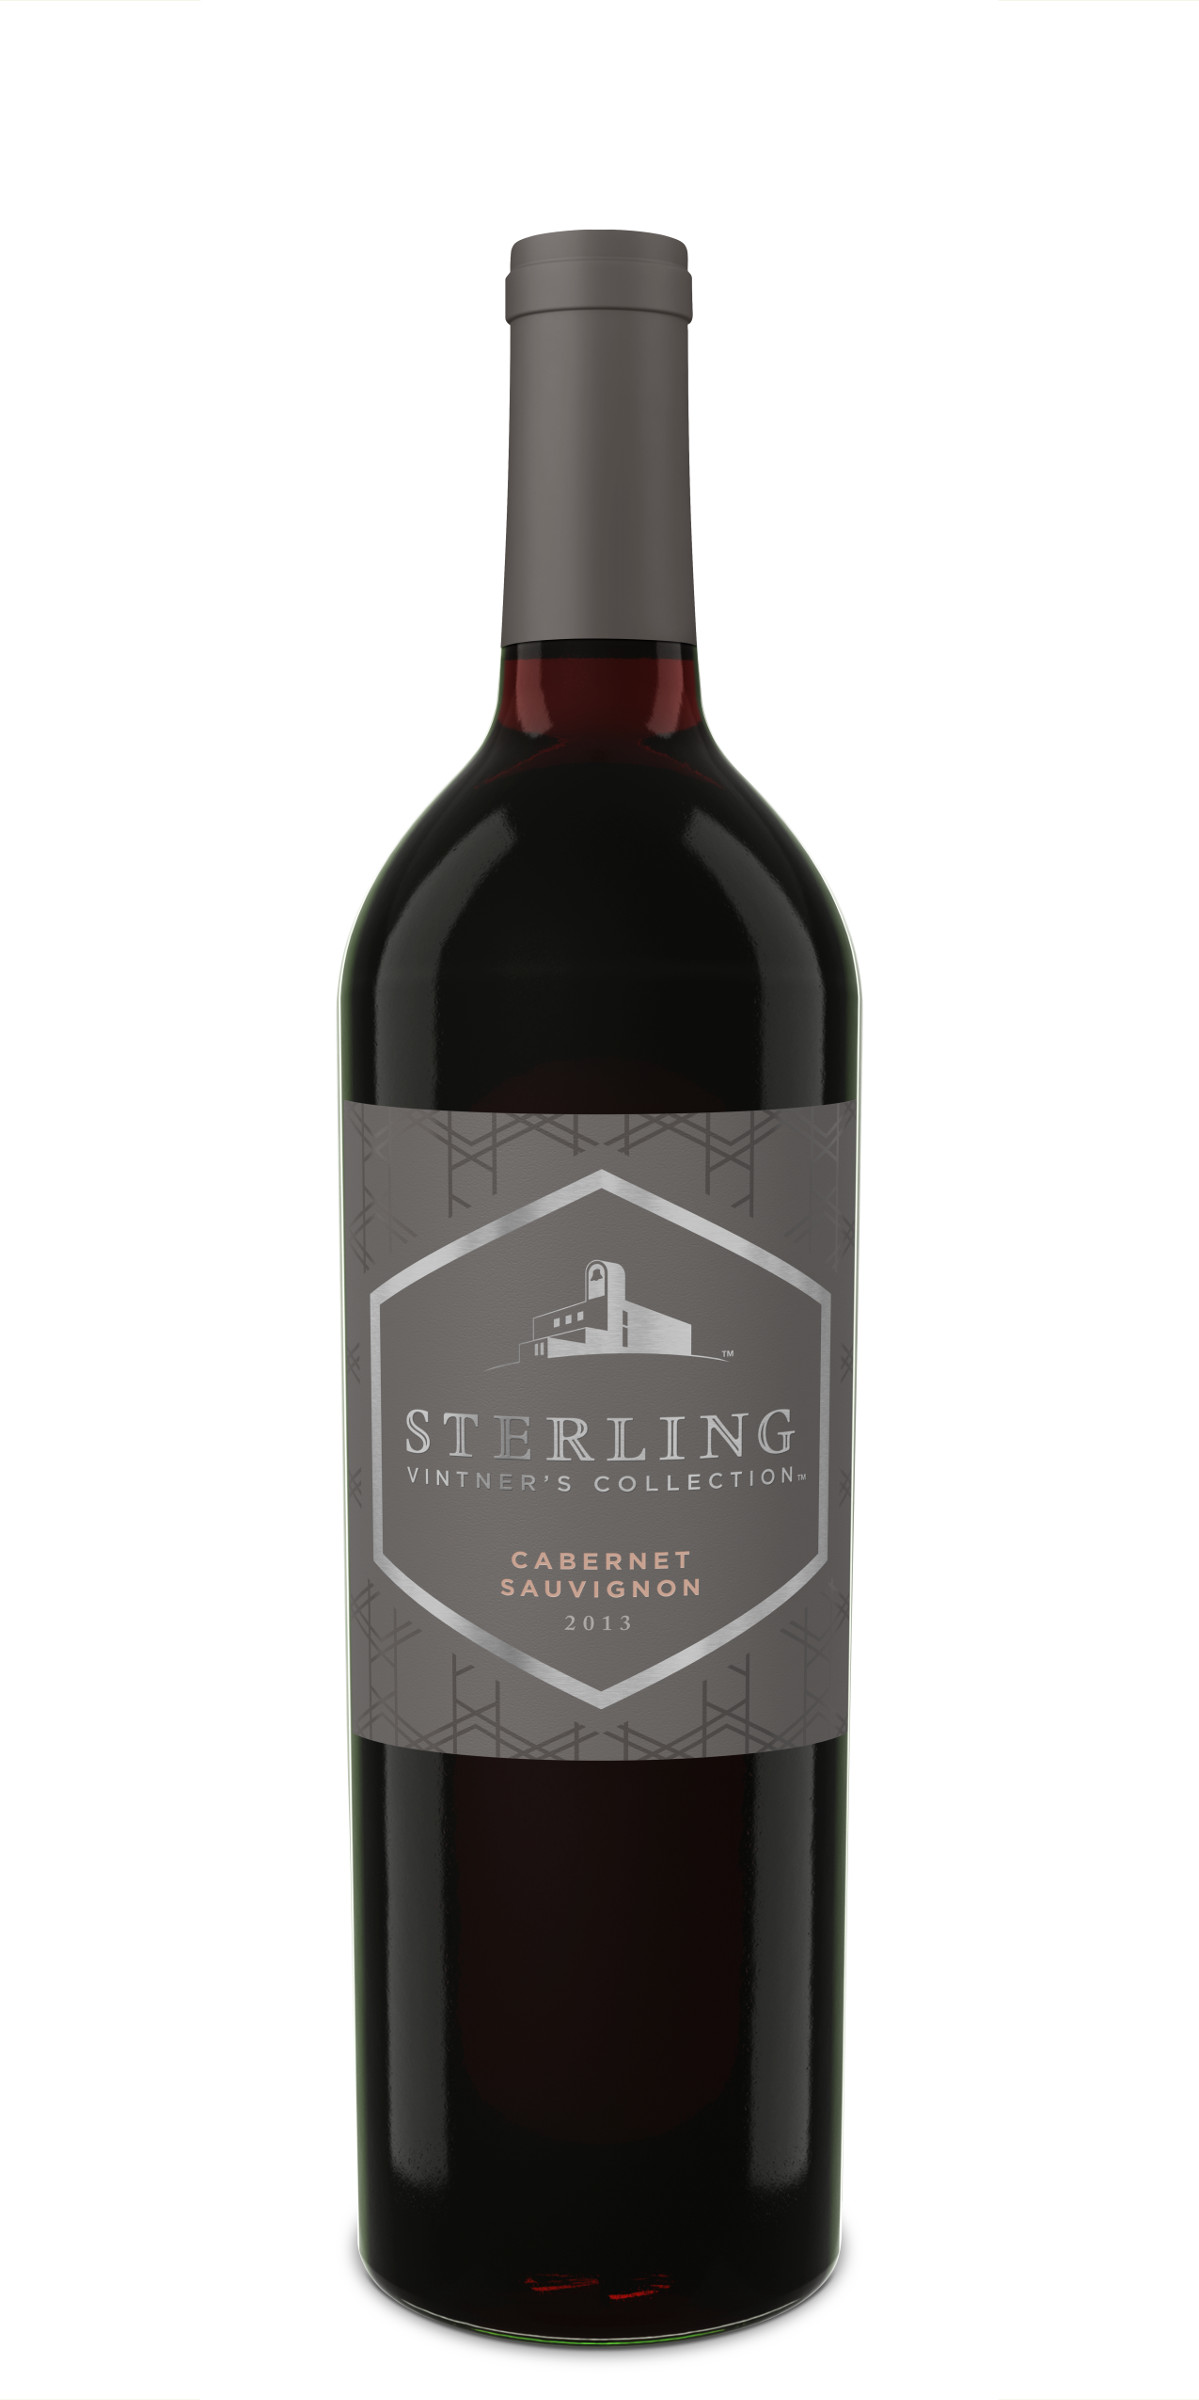 sterling cabernet sauvignon 2014 review